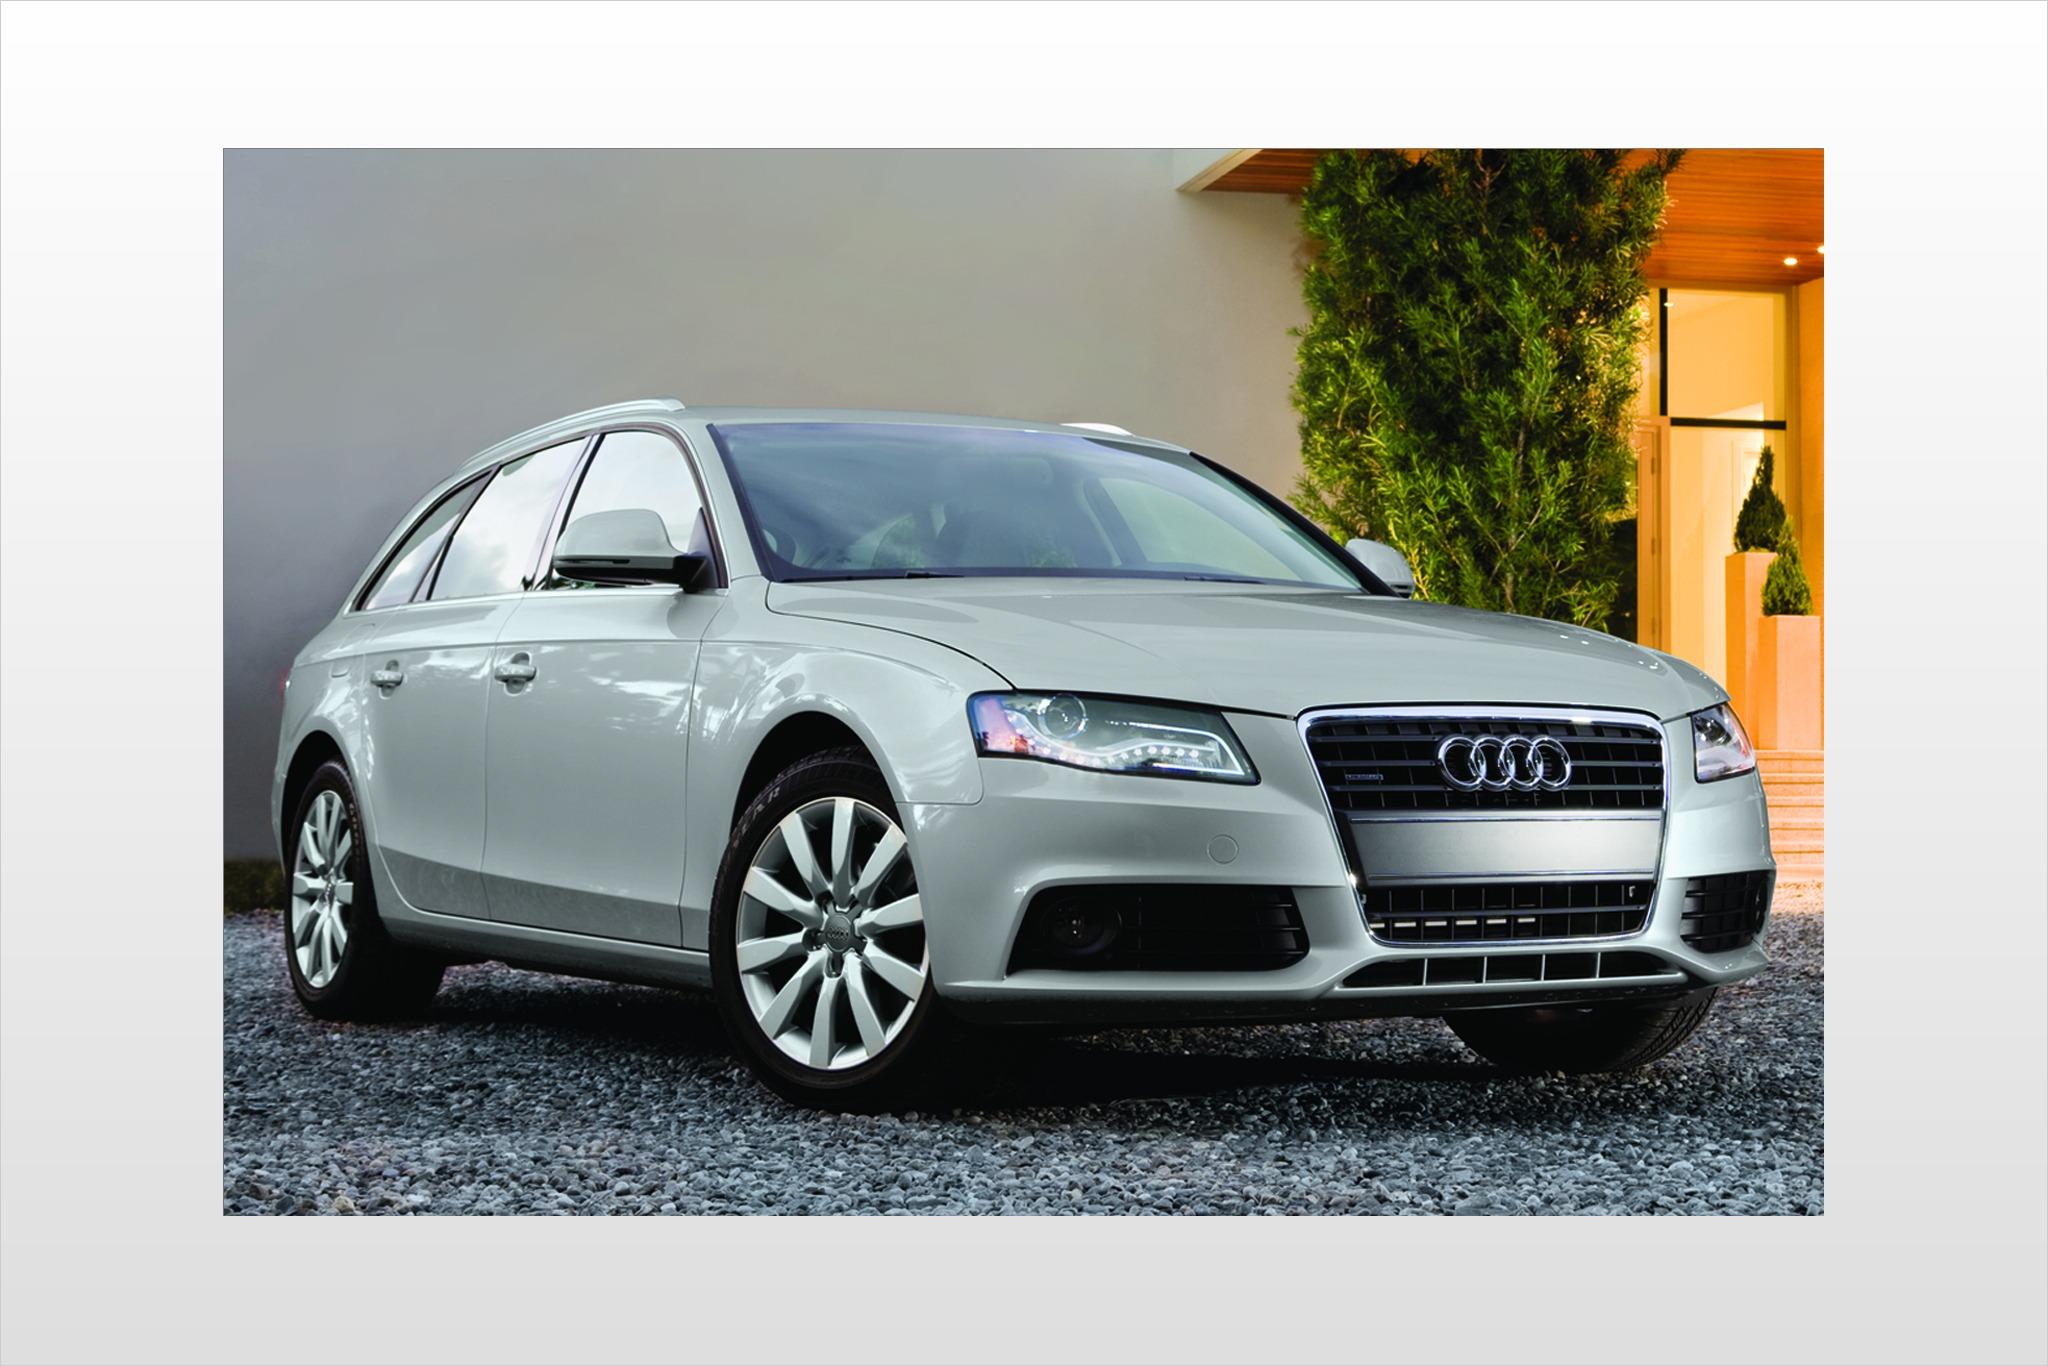 2010 Audi A4 Image 1